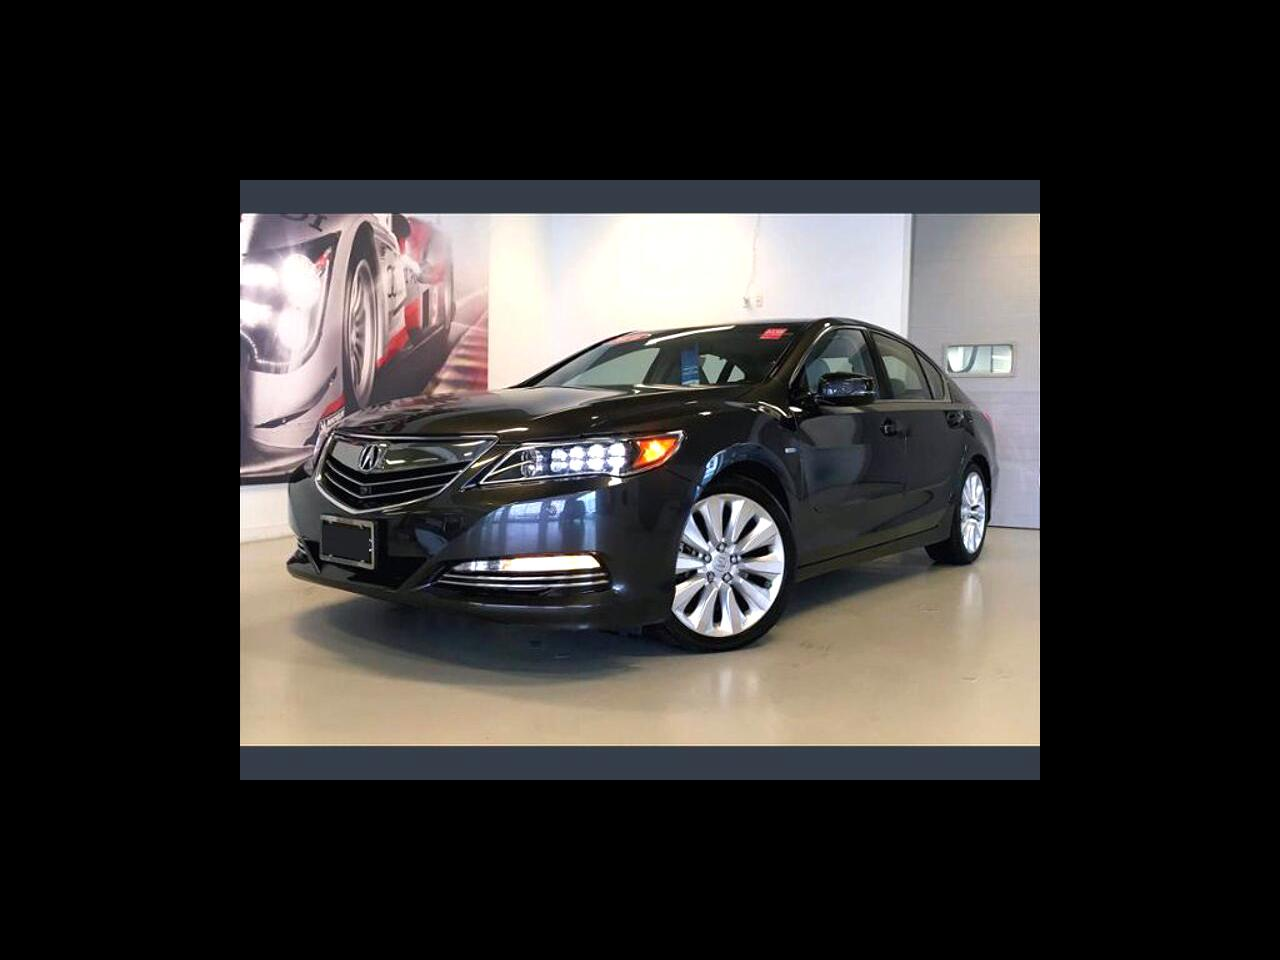 Acura RLX 4dr Sdn Hybrid Advance Pkg 2016